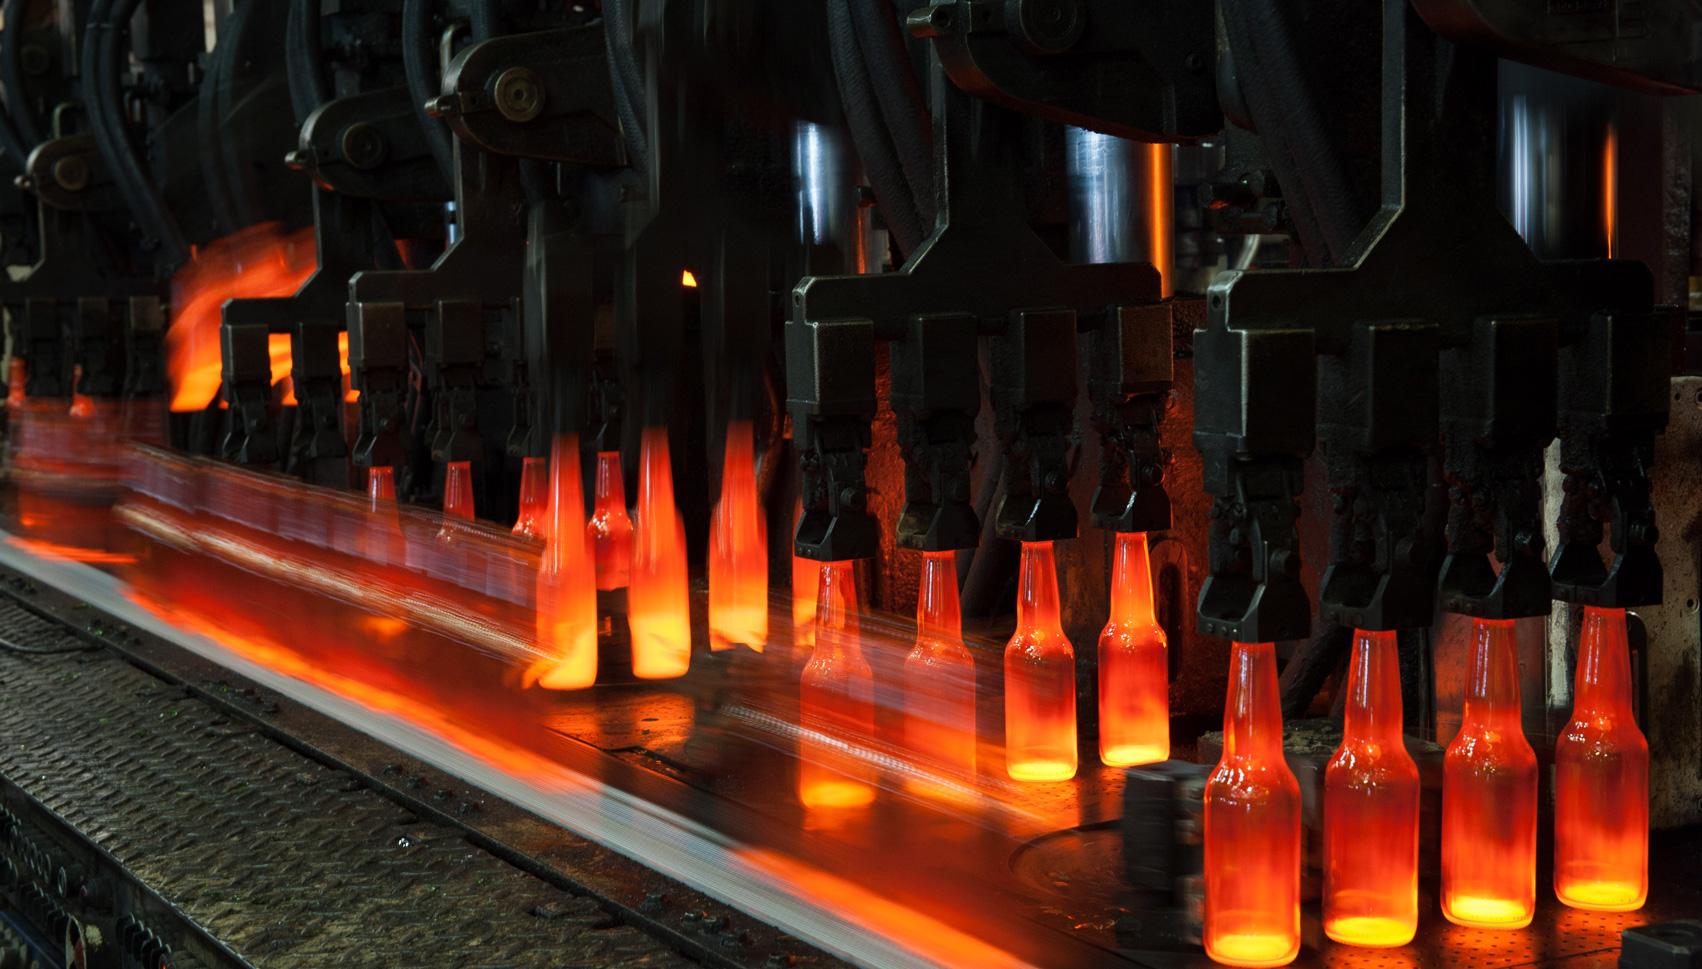 Historia del vidrio anfevi - Fabrica de floreros de vidrio ...